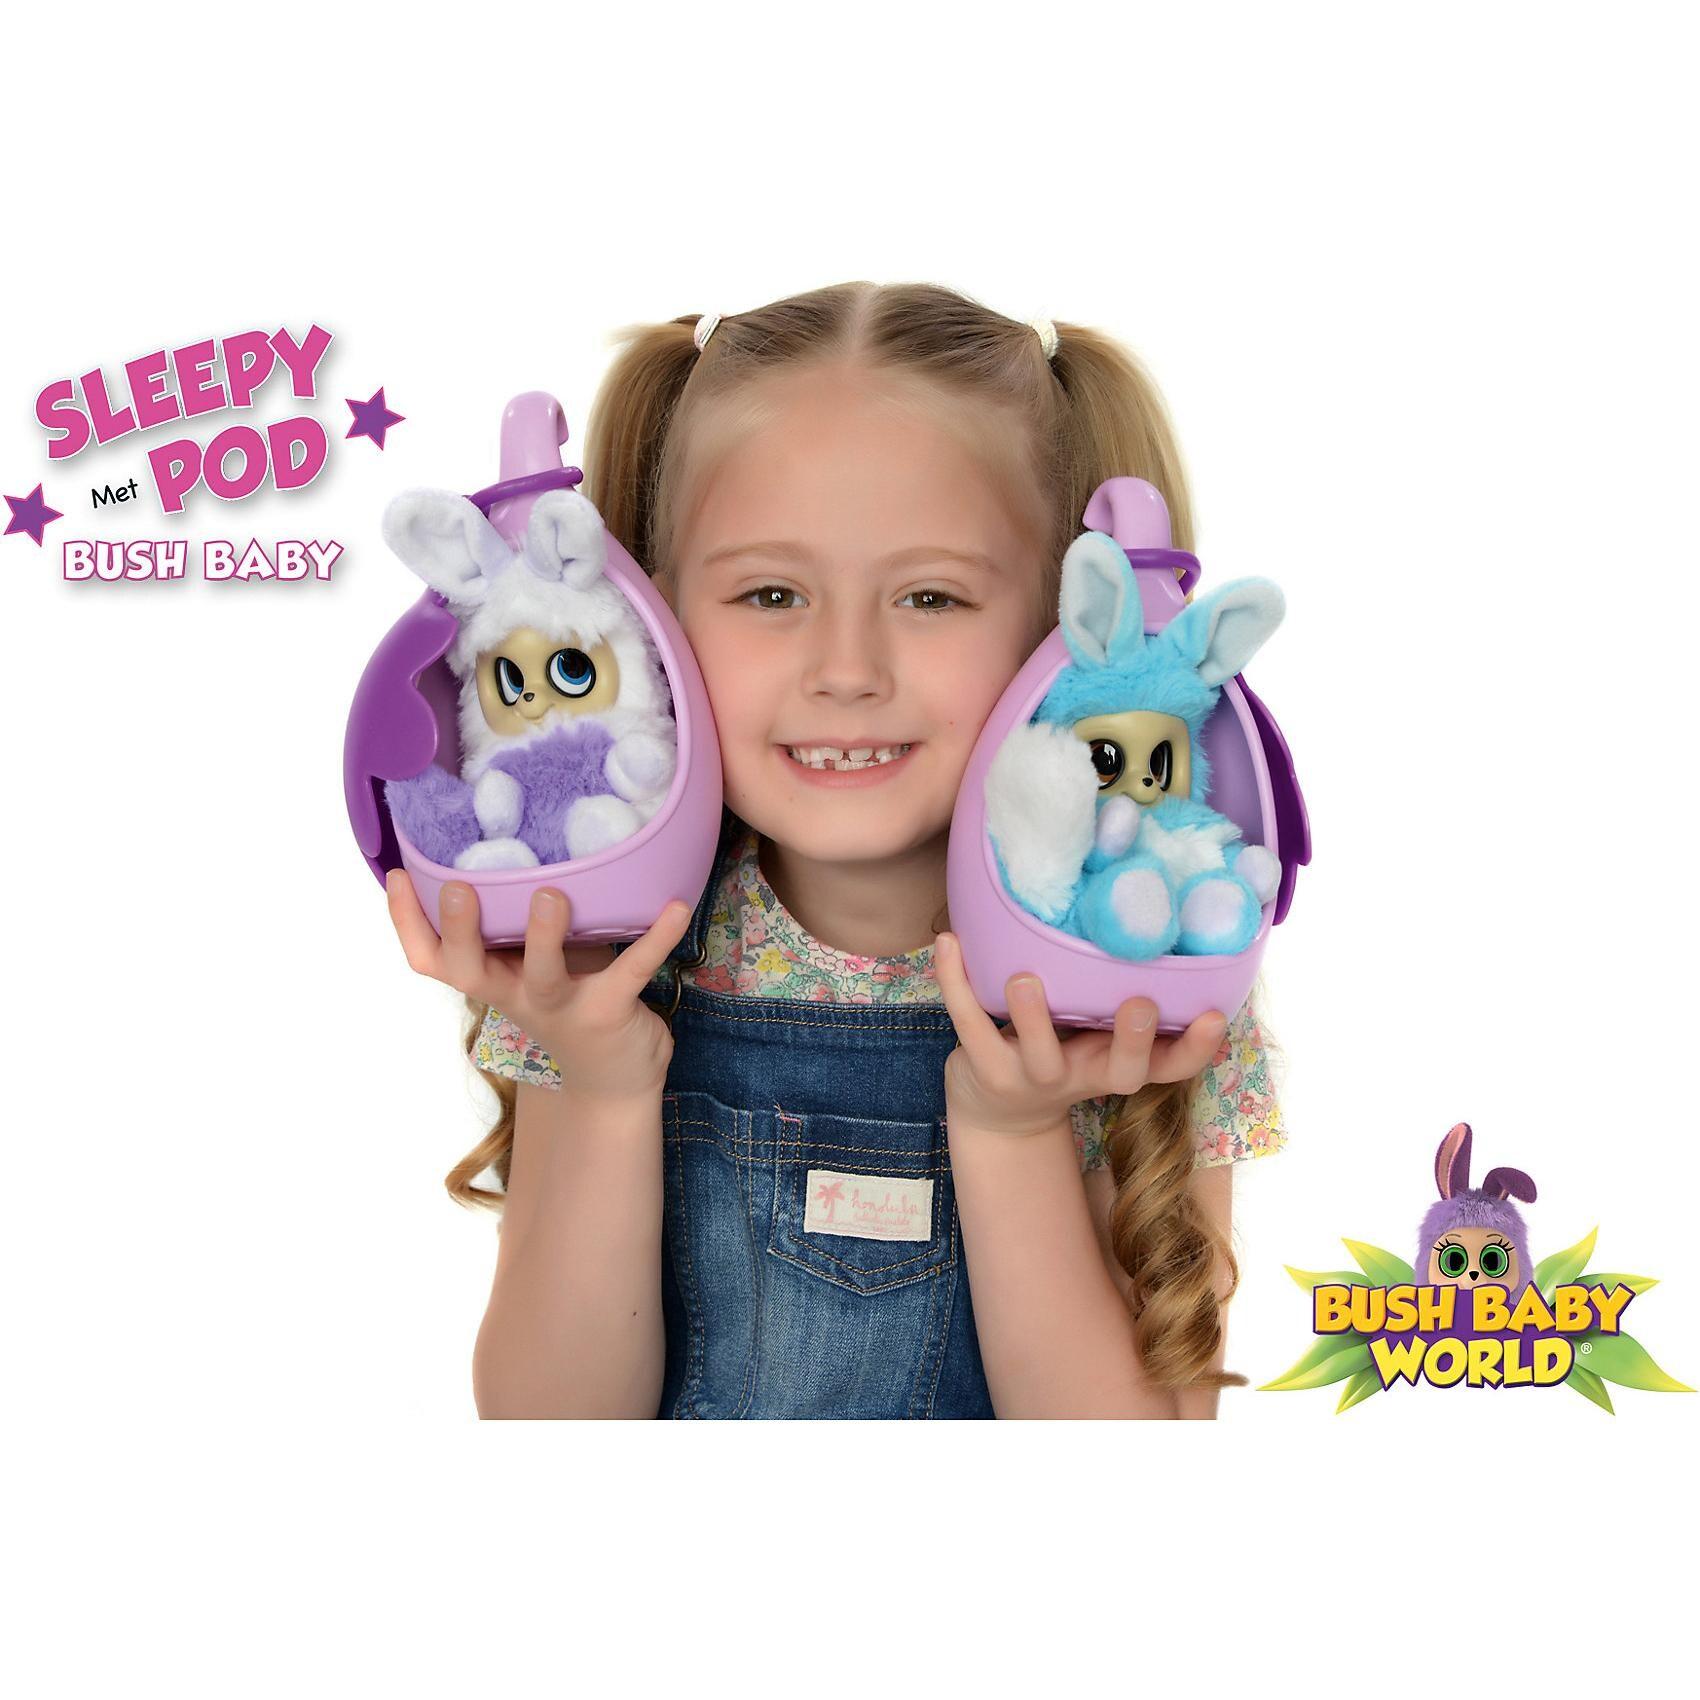 Spectron Toys Bush Baby World Sleepy Pod Adero